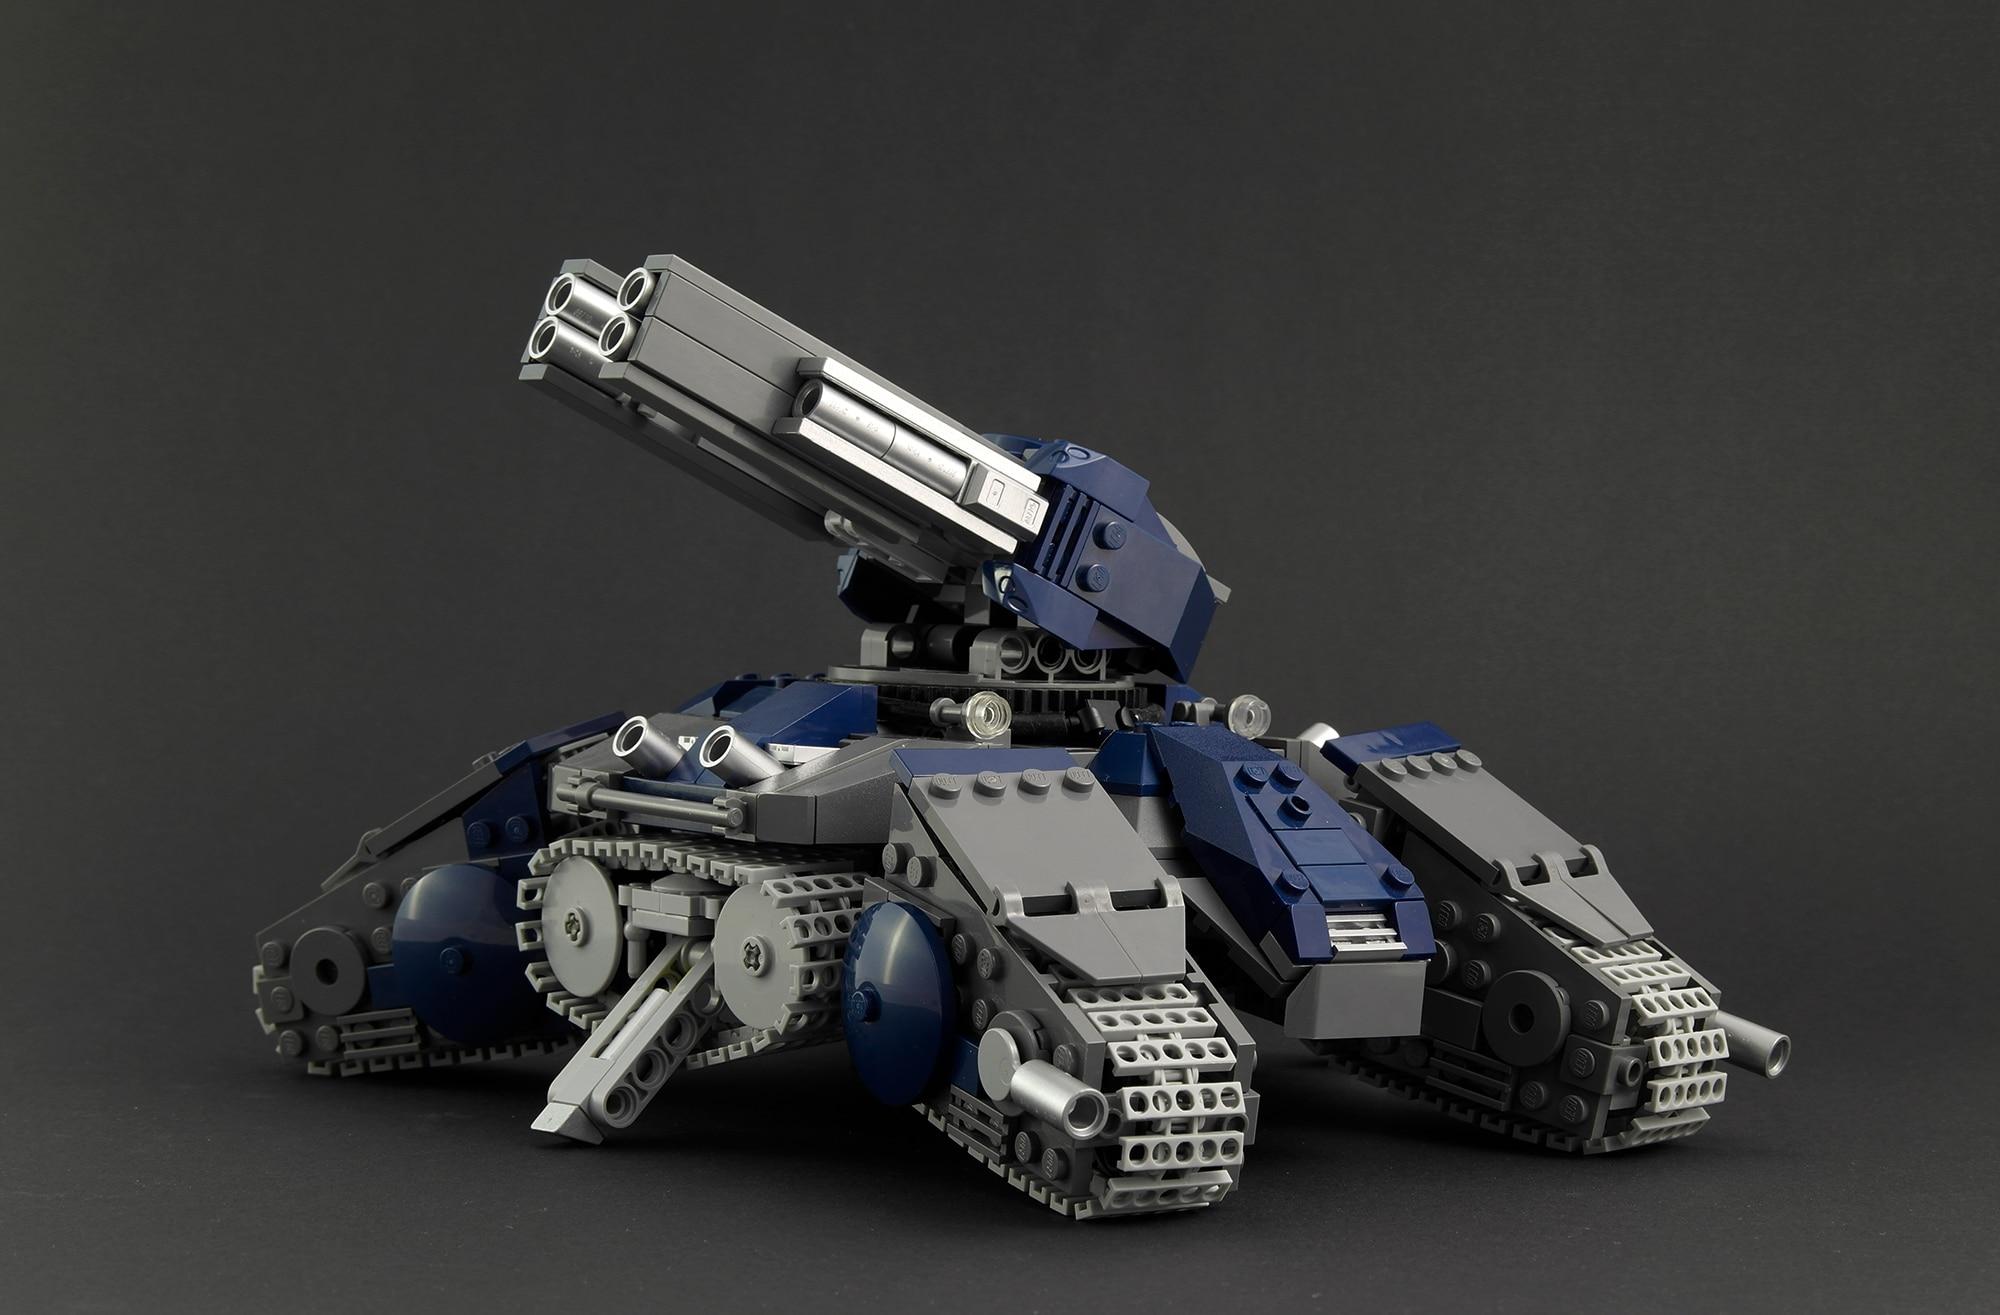 LEGO Moc Iron Builder 2016 Siegetank